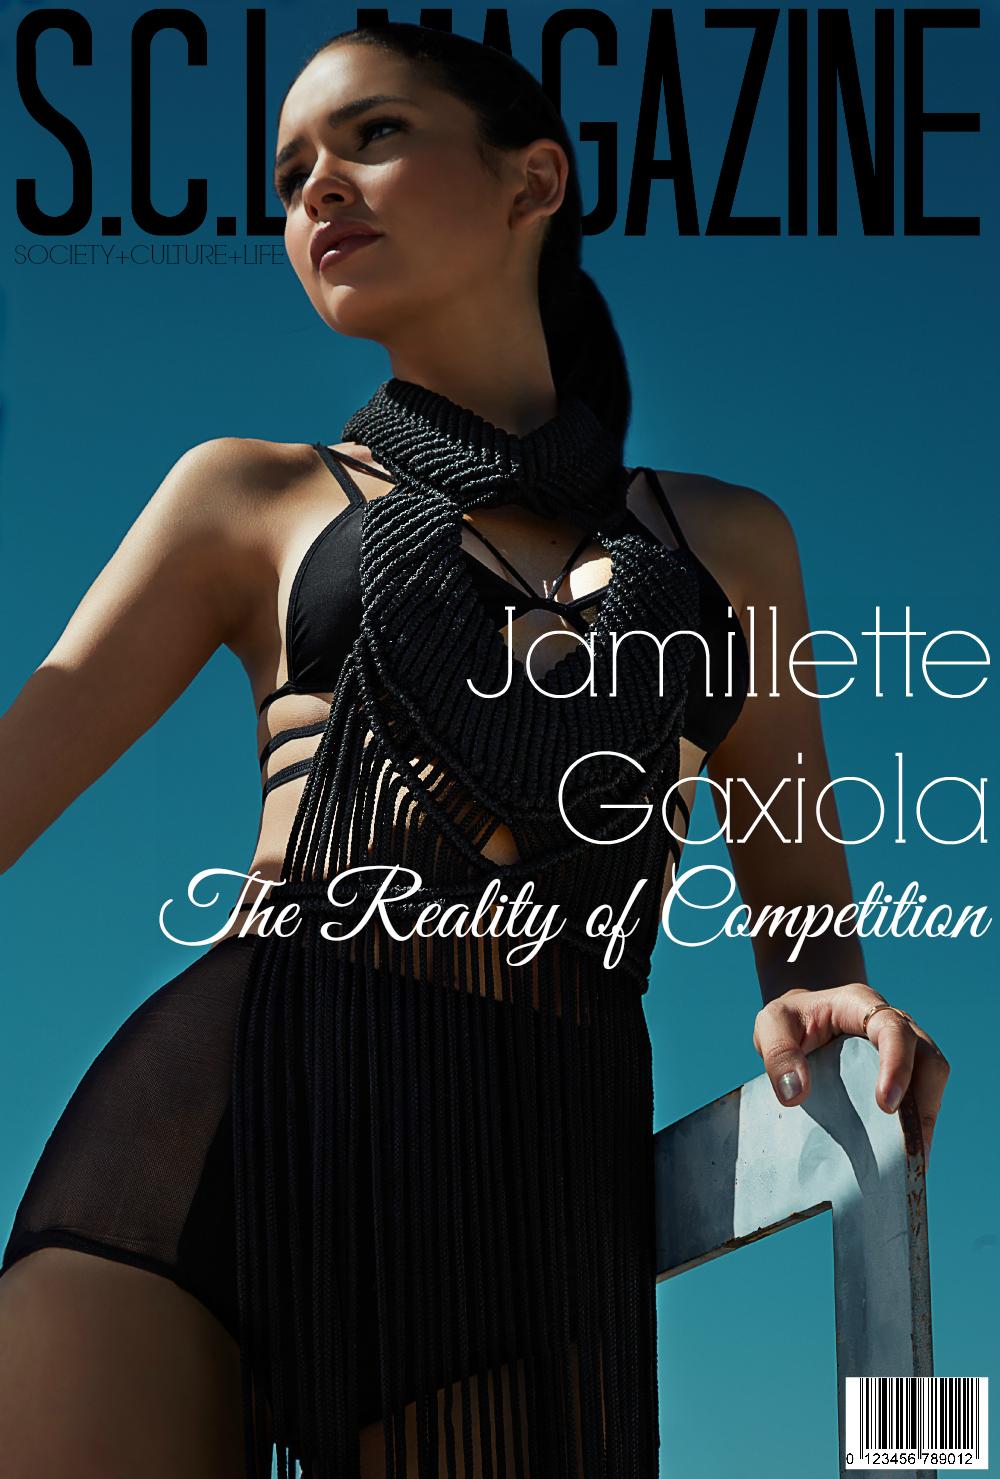 jamilette.gaxiola_1000x1479